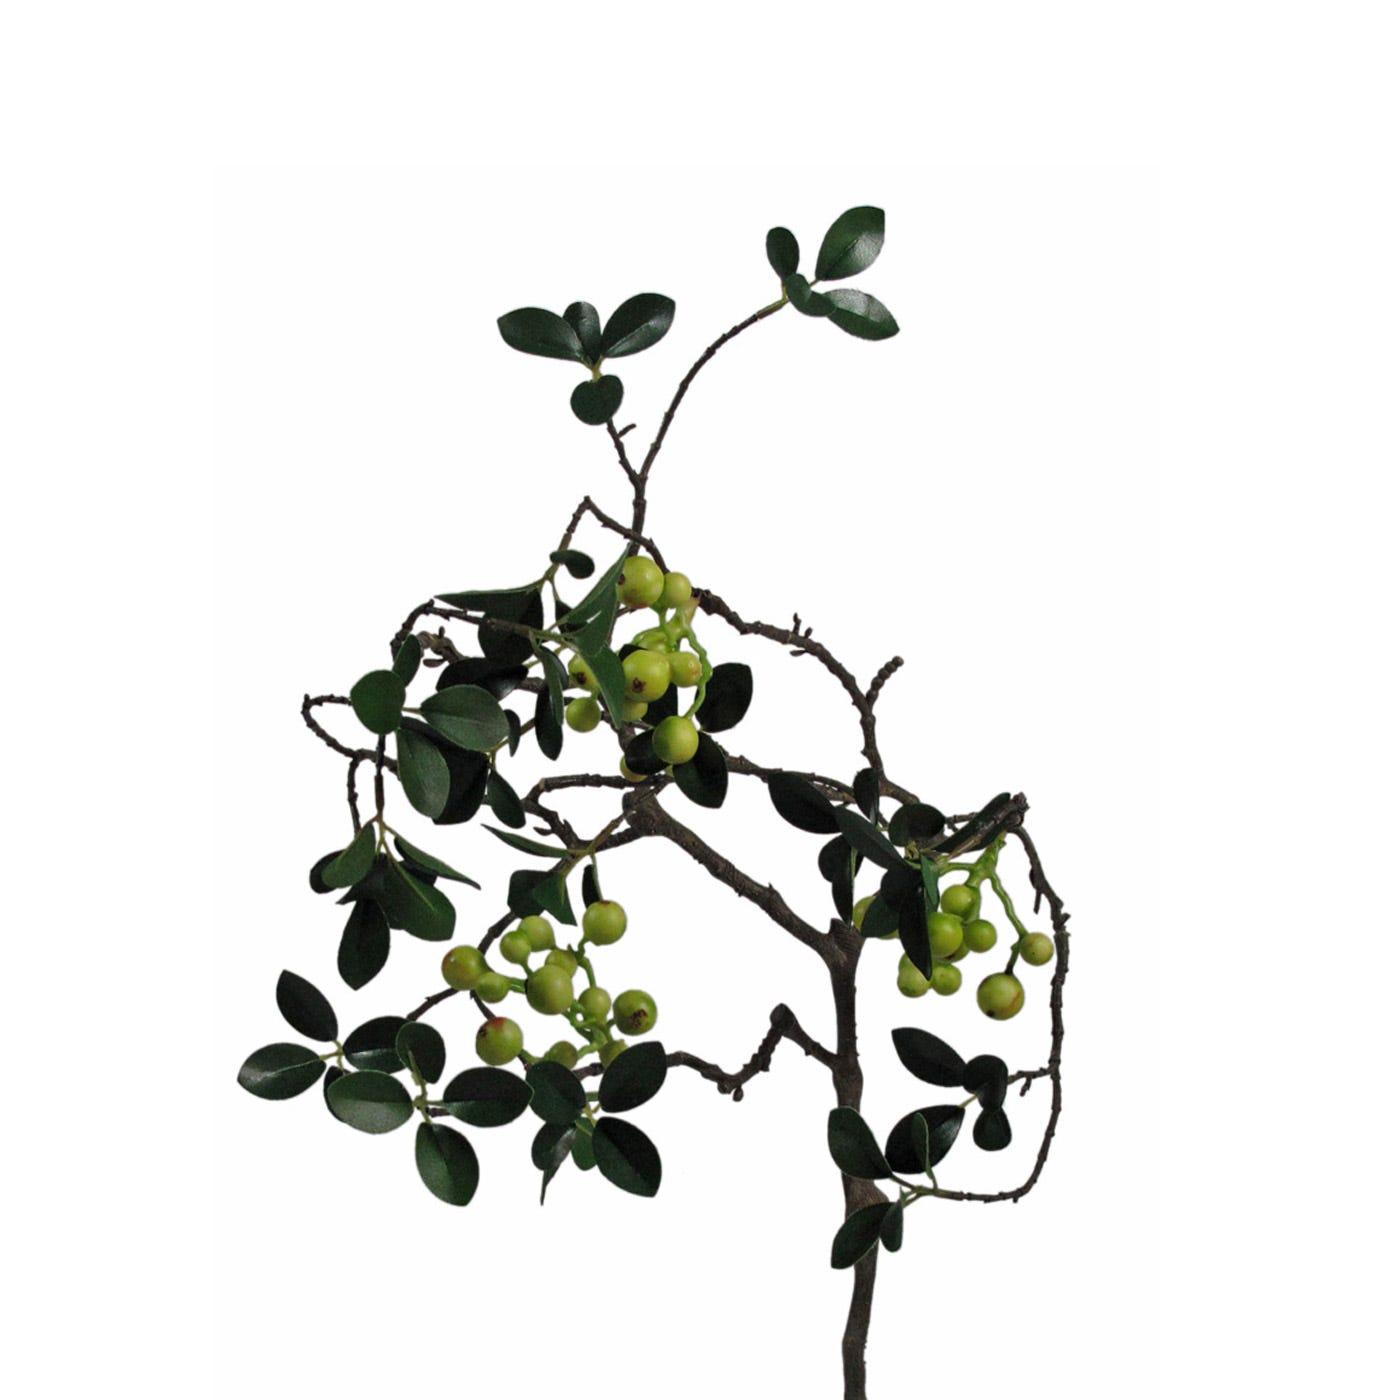 Evergreen Berry Stem